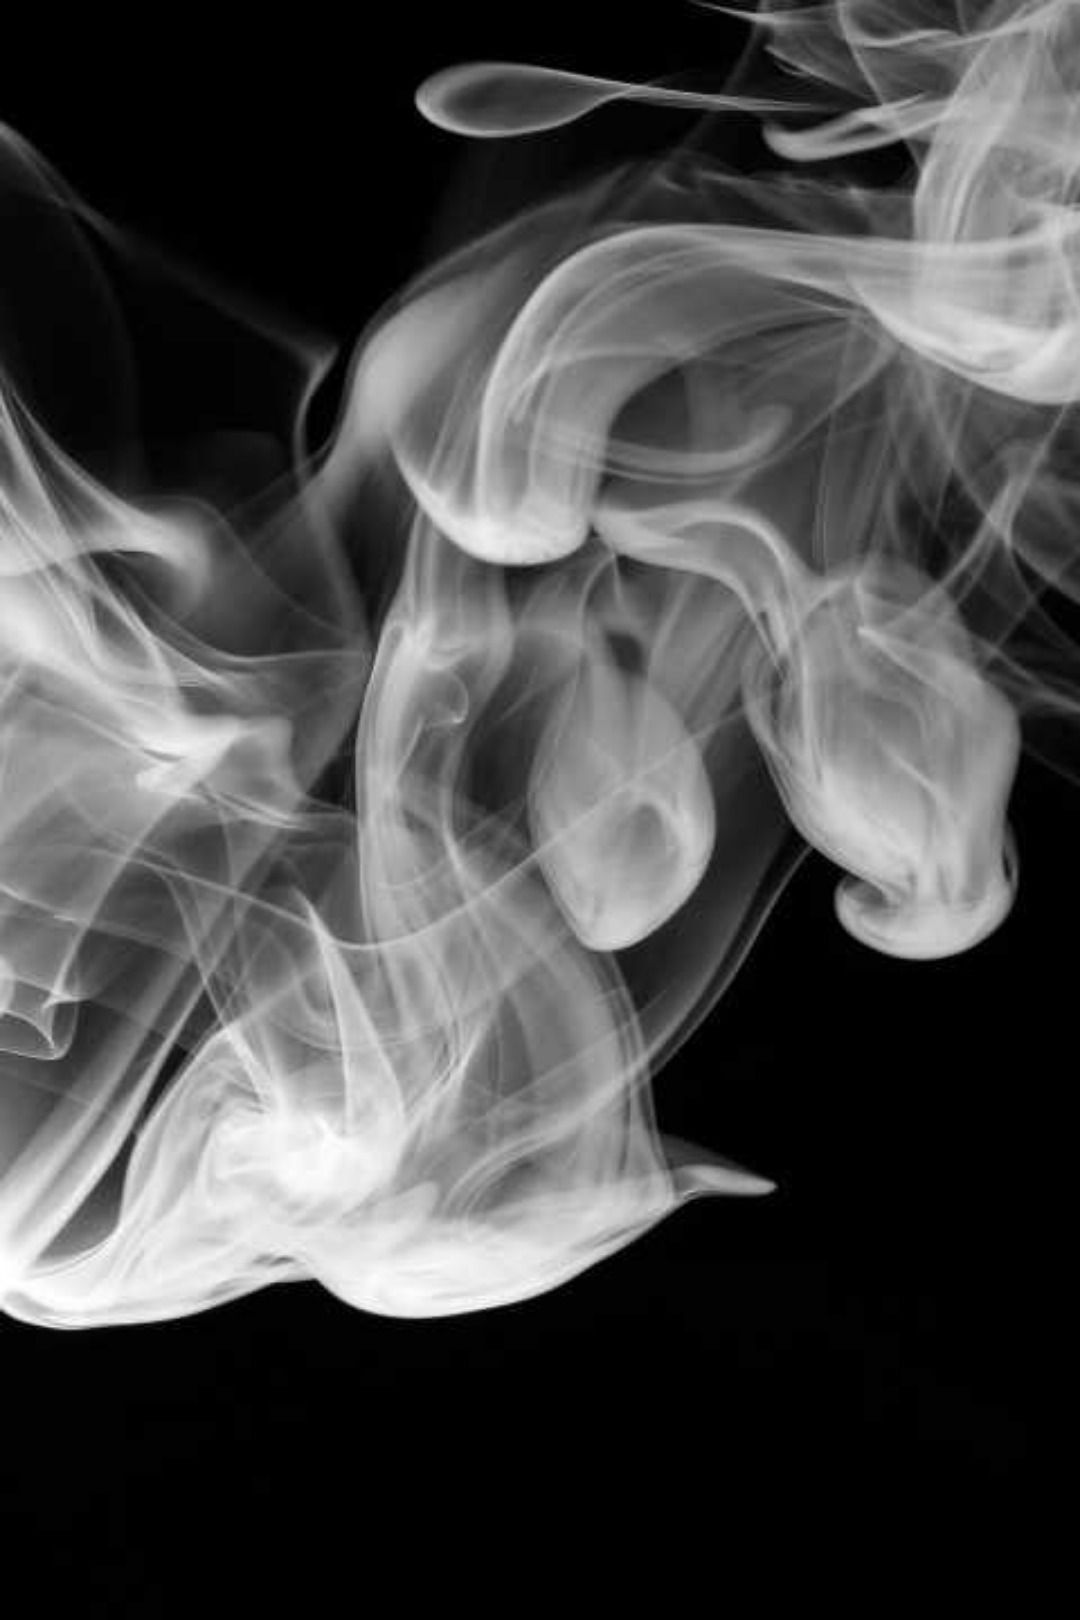 Smoke Monochrome Blackandwhite Black Background Photooftheday Beautiful Wonderful Amazing Aw Wallpaper Backgrounds Hd Wallpaper Amazing Hd Wallpapers